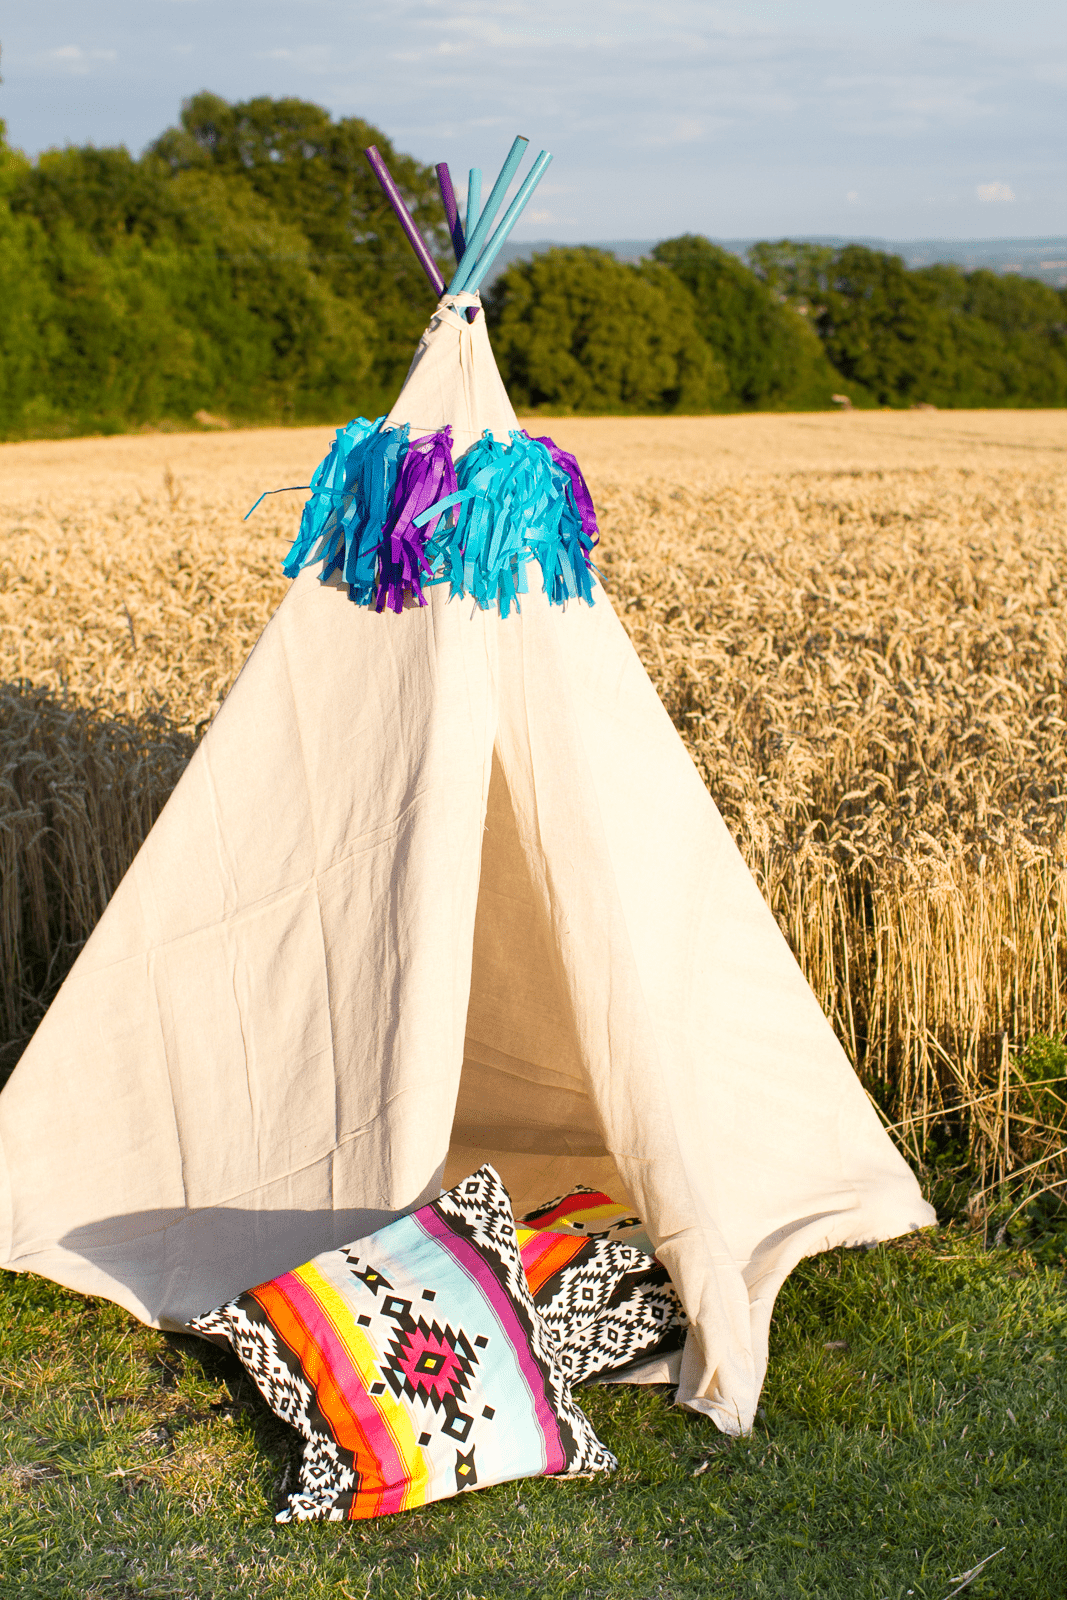 DIY Mini Tipi + Video Tutorial! & How to make a DIY Mini Tipi Teepee Summer Tent | DIY Wedding Blog ...